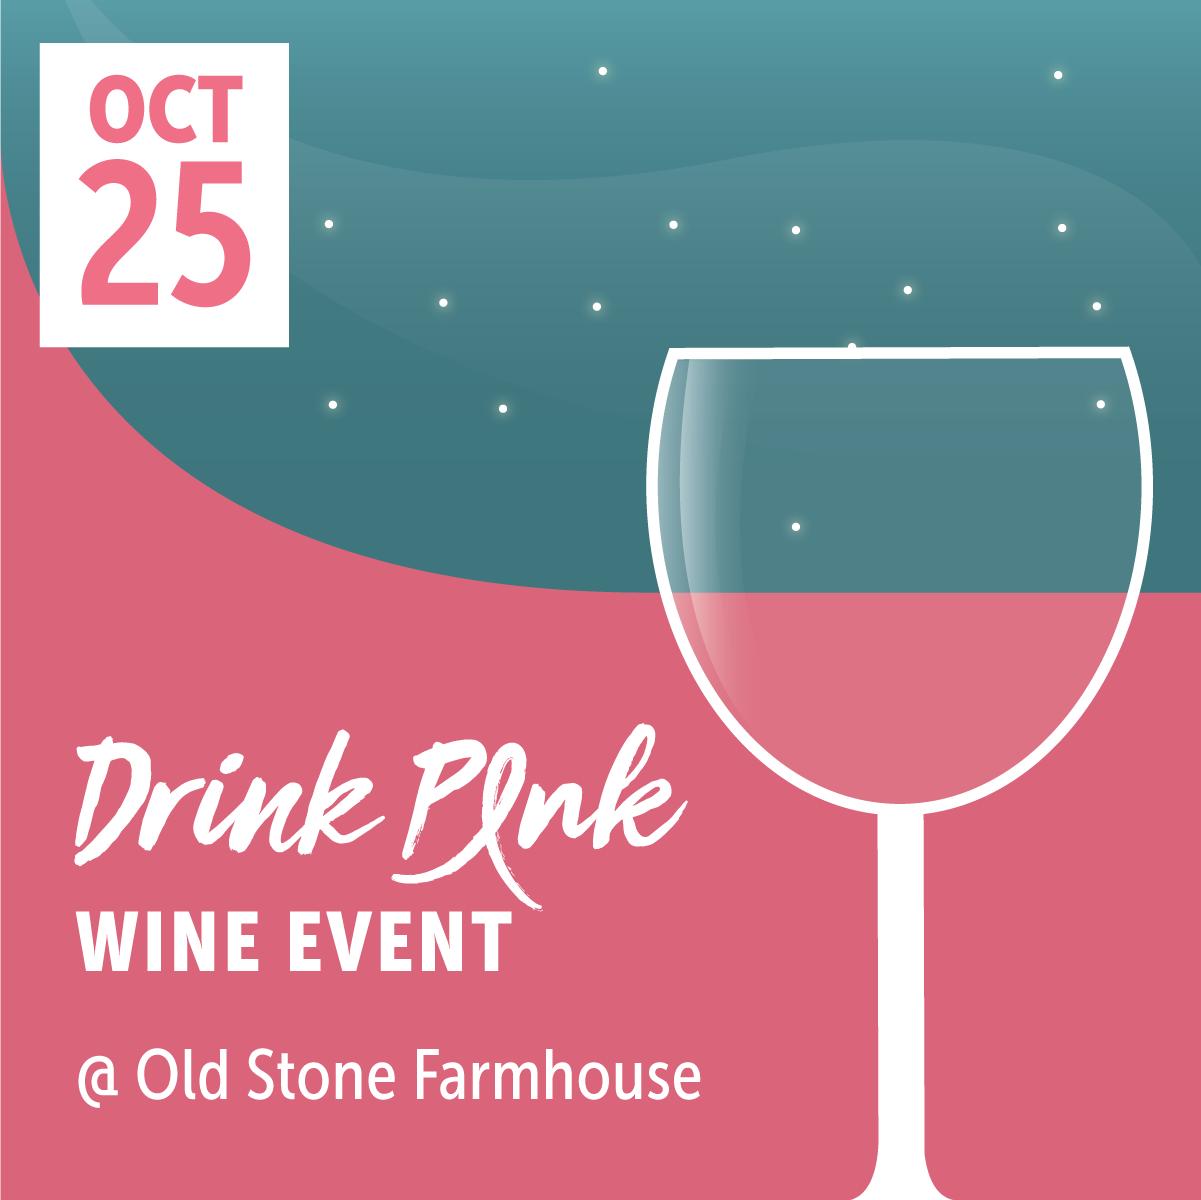 Drink Pink Wine Event